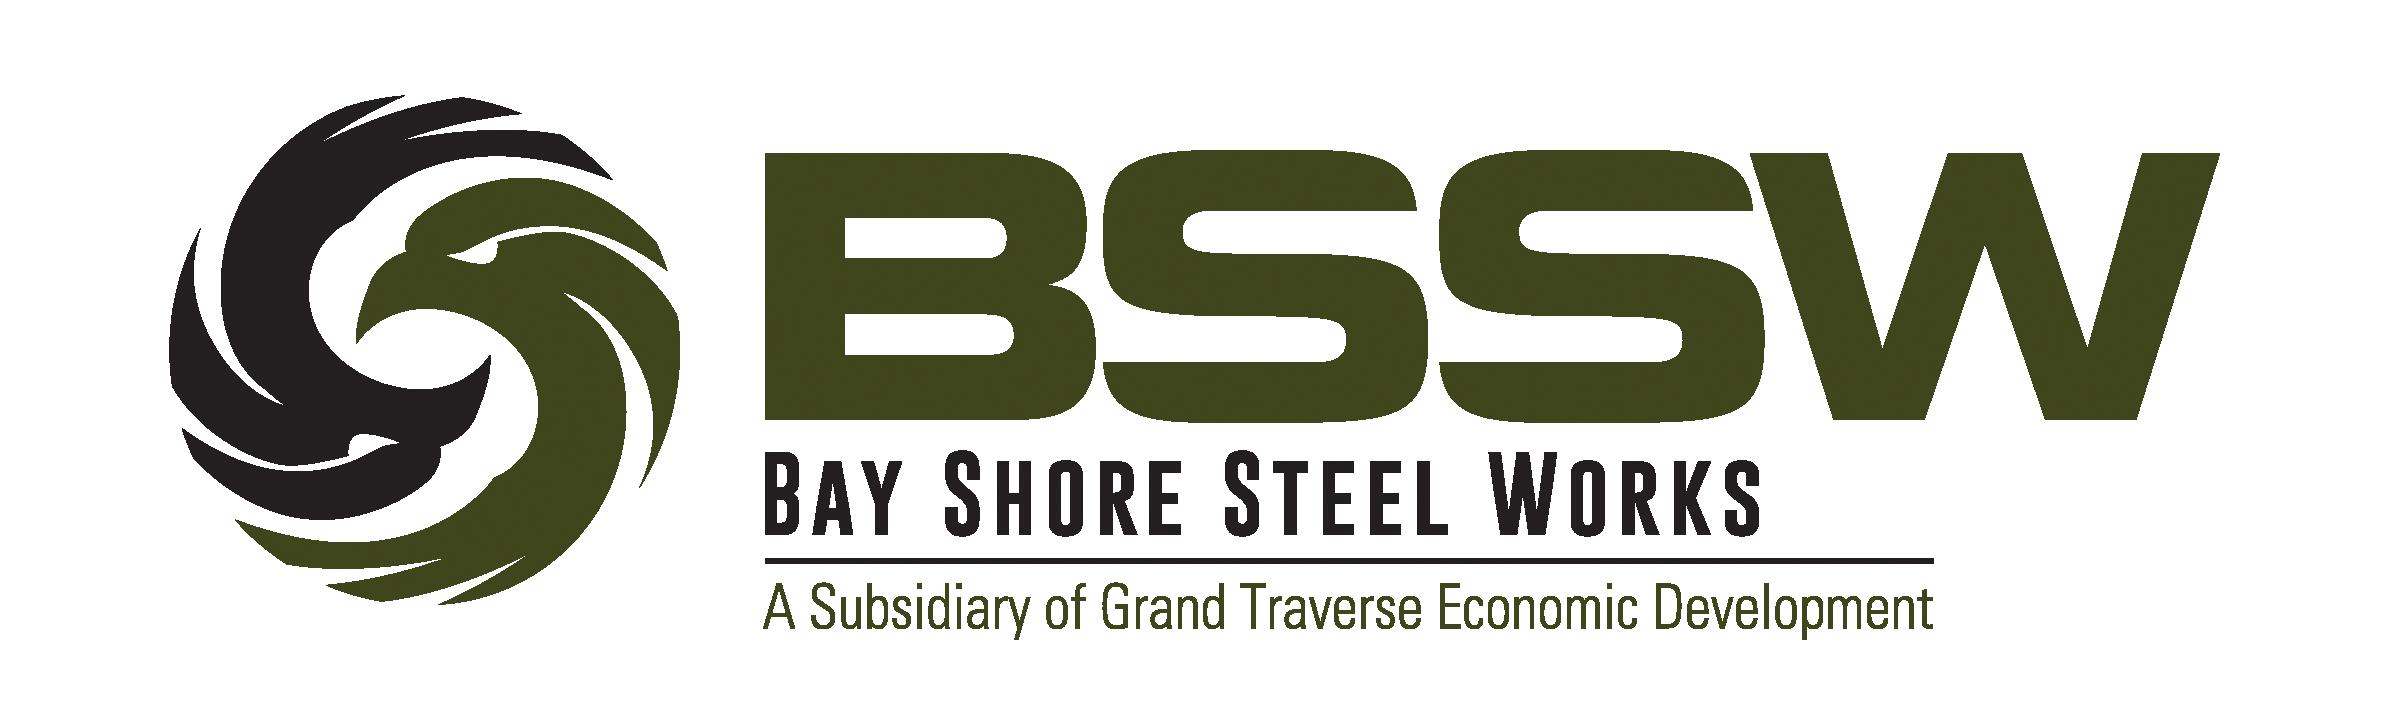 Bay Shore Steel Works